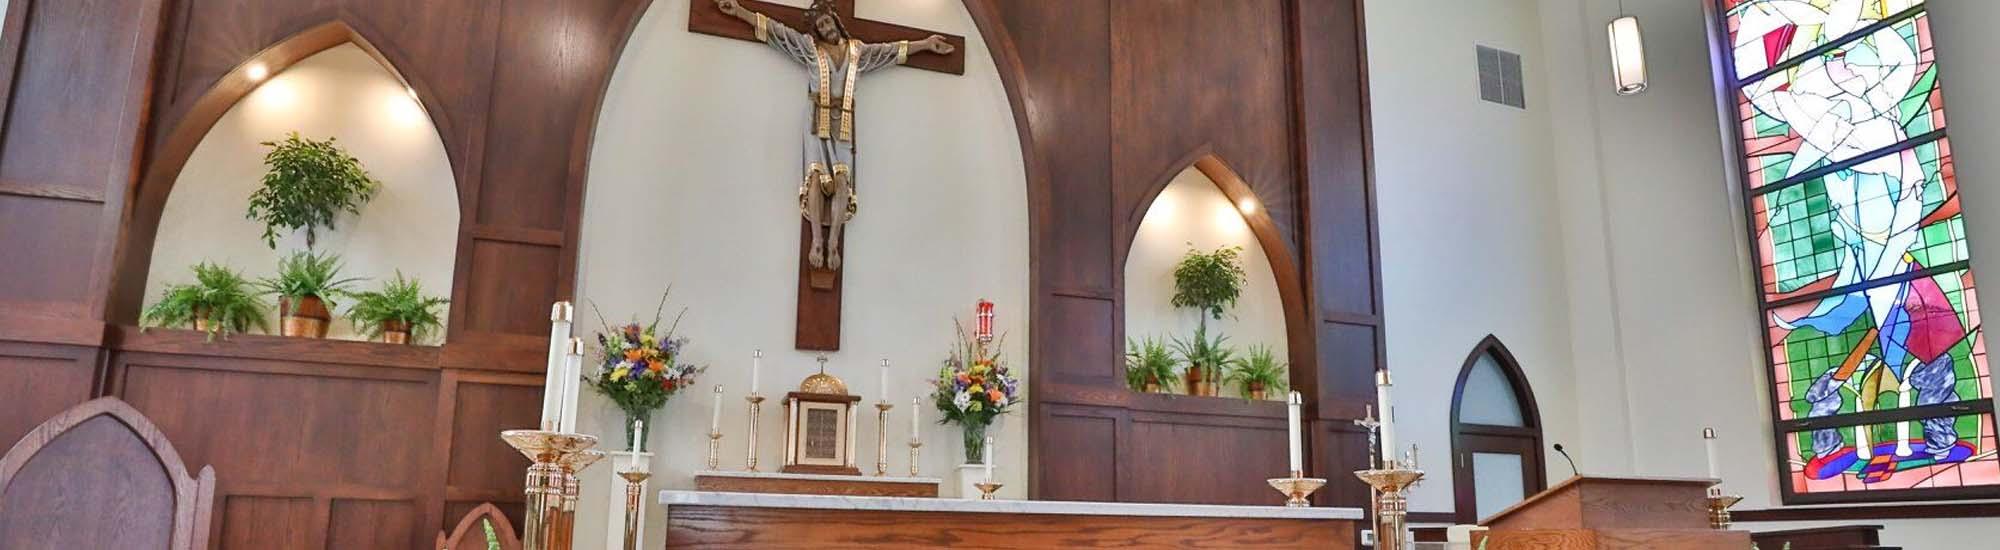 Mary, Seat of Wisdom Chapel